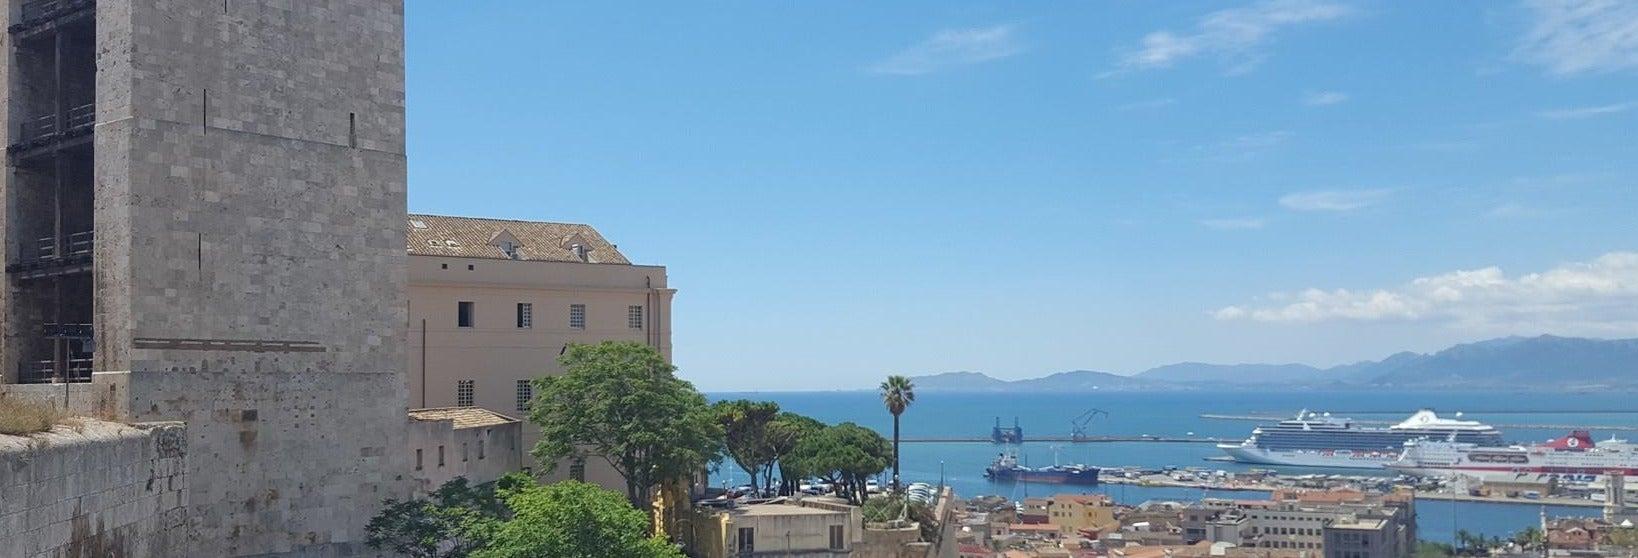 Tour di Cagliari per croceristi